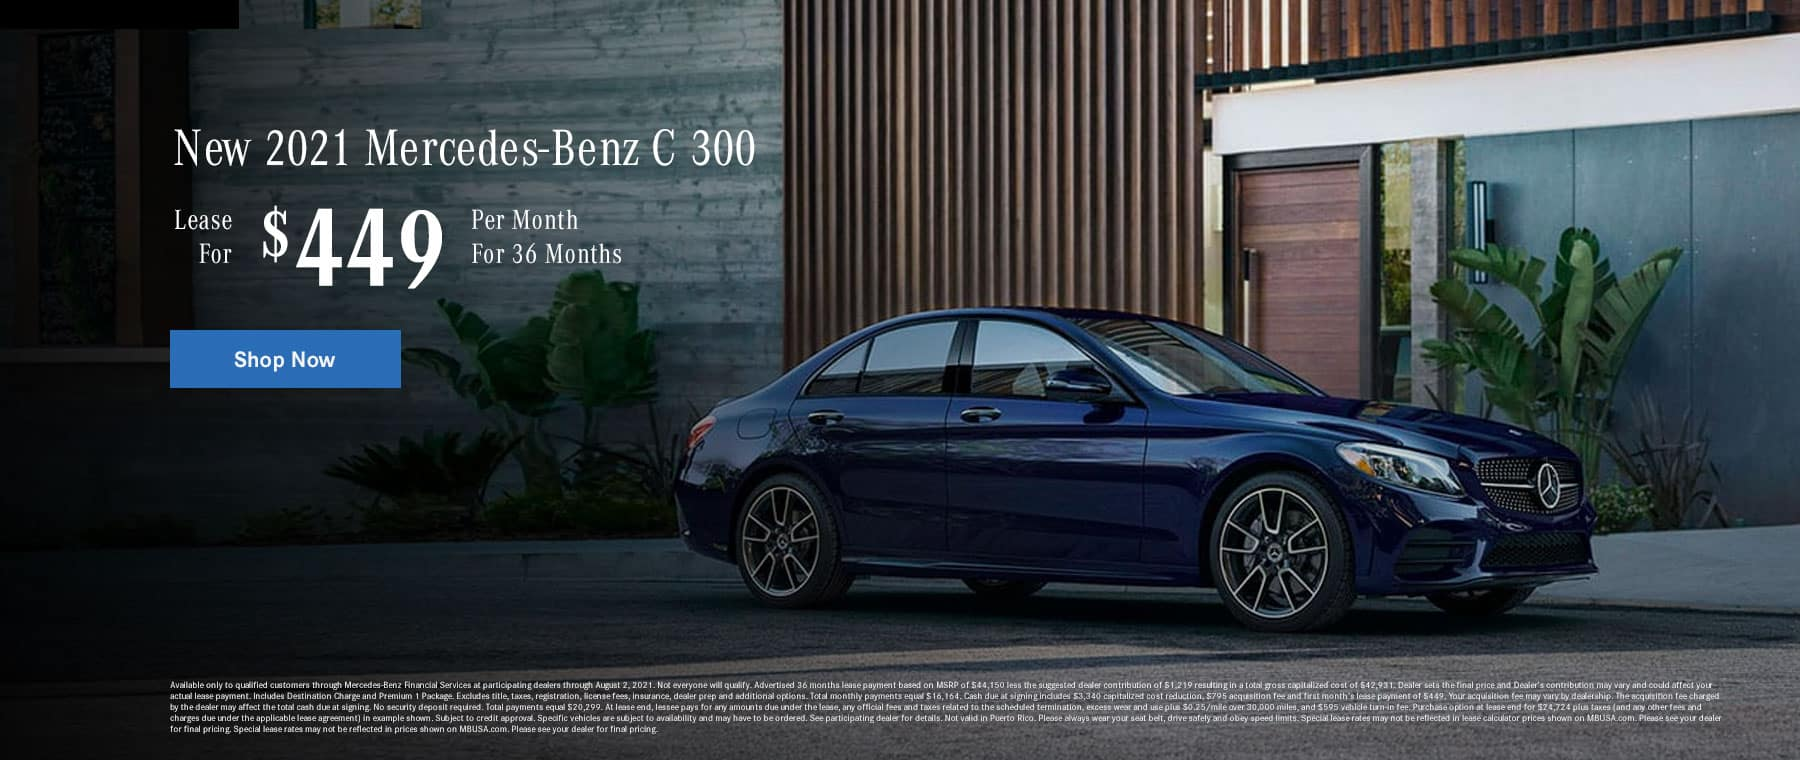 021 C 300 Sedan Lease for $449/36 months